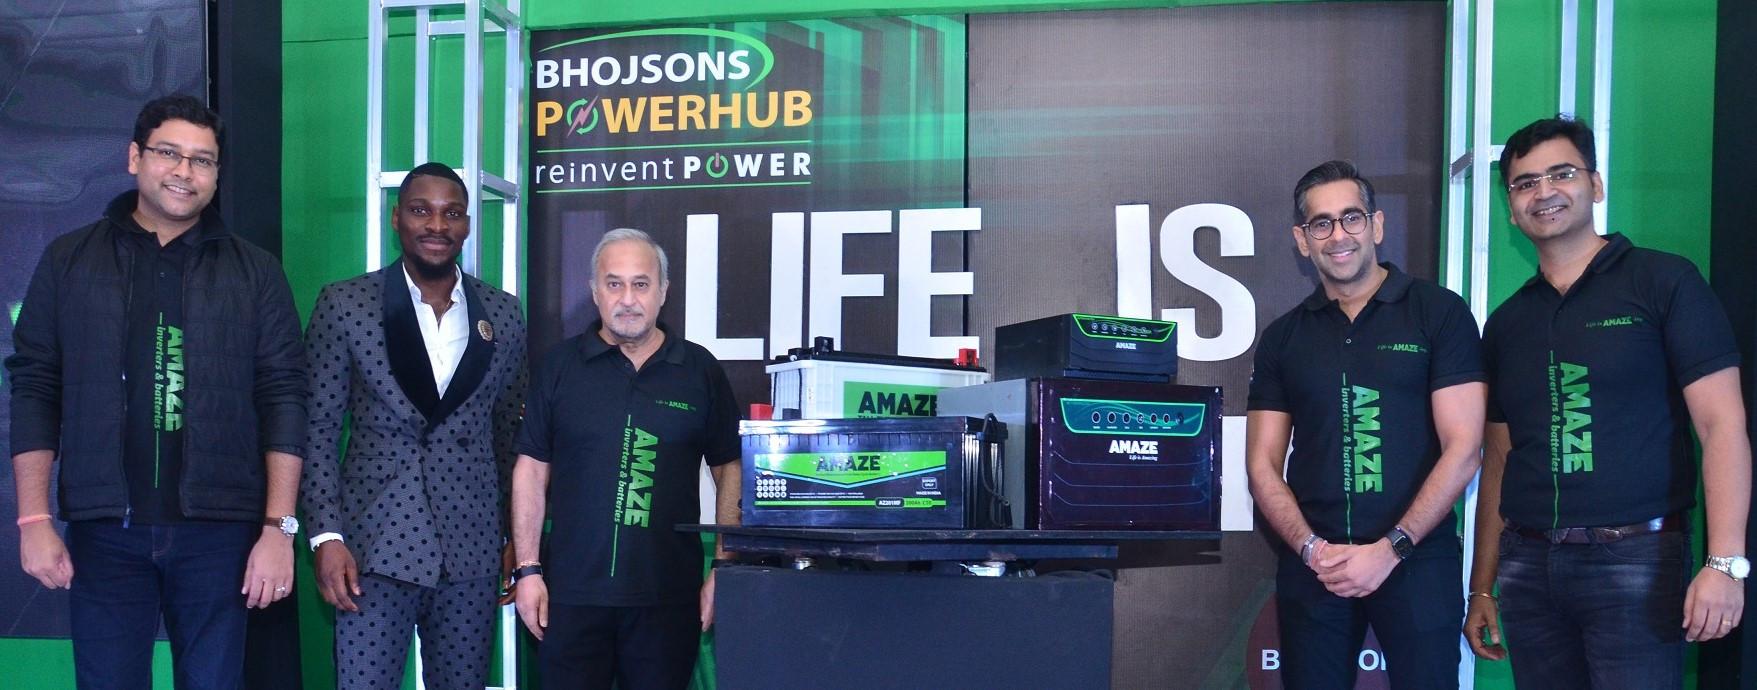 Tobi Bakre, PencilComedian excite dealers as Bhojsons Powerhub Unveils new 'Amaze' Power Backup Solution